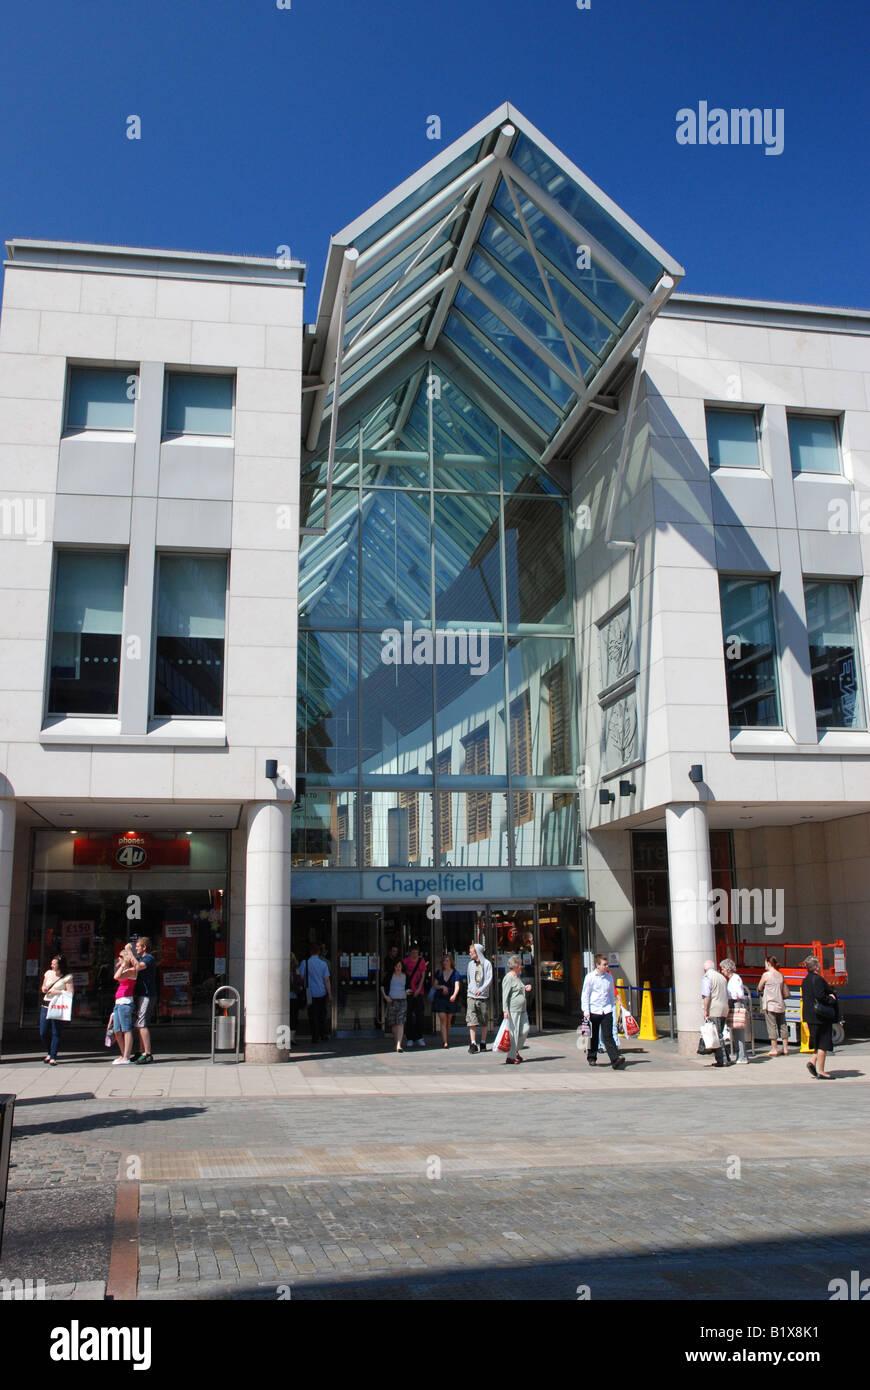 Entrance to Chapelfield Mall, Norwich, Norfolk - Stock Image